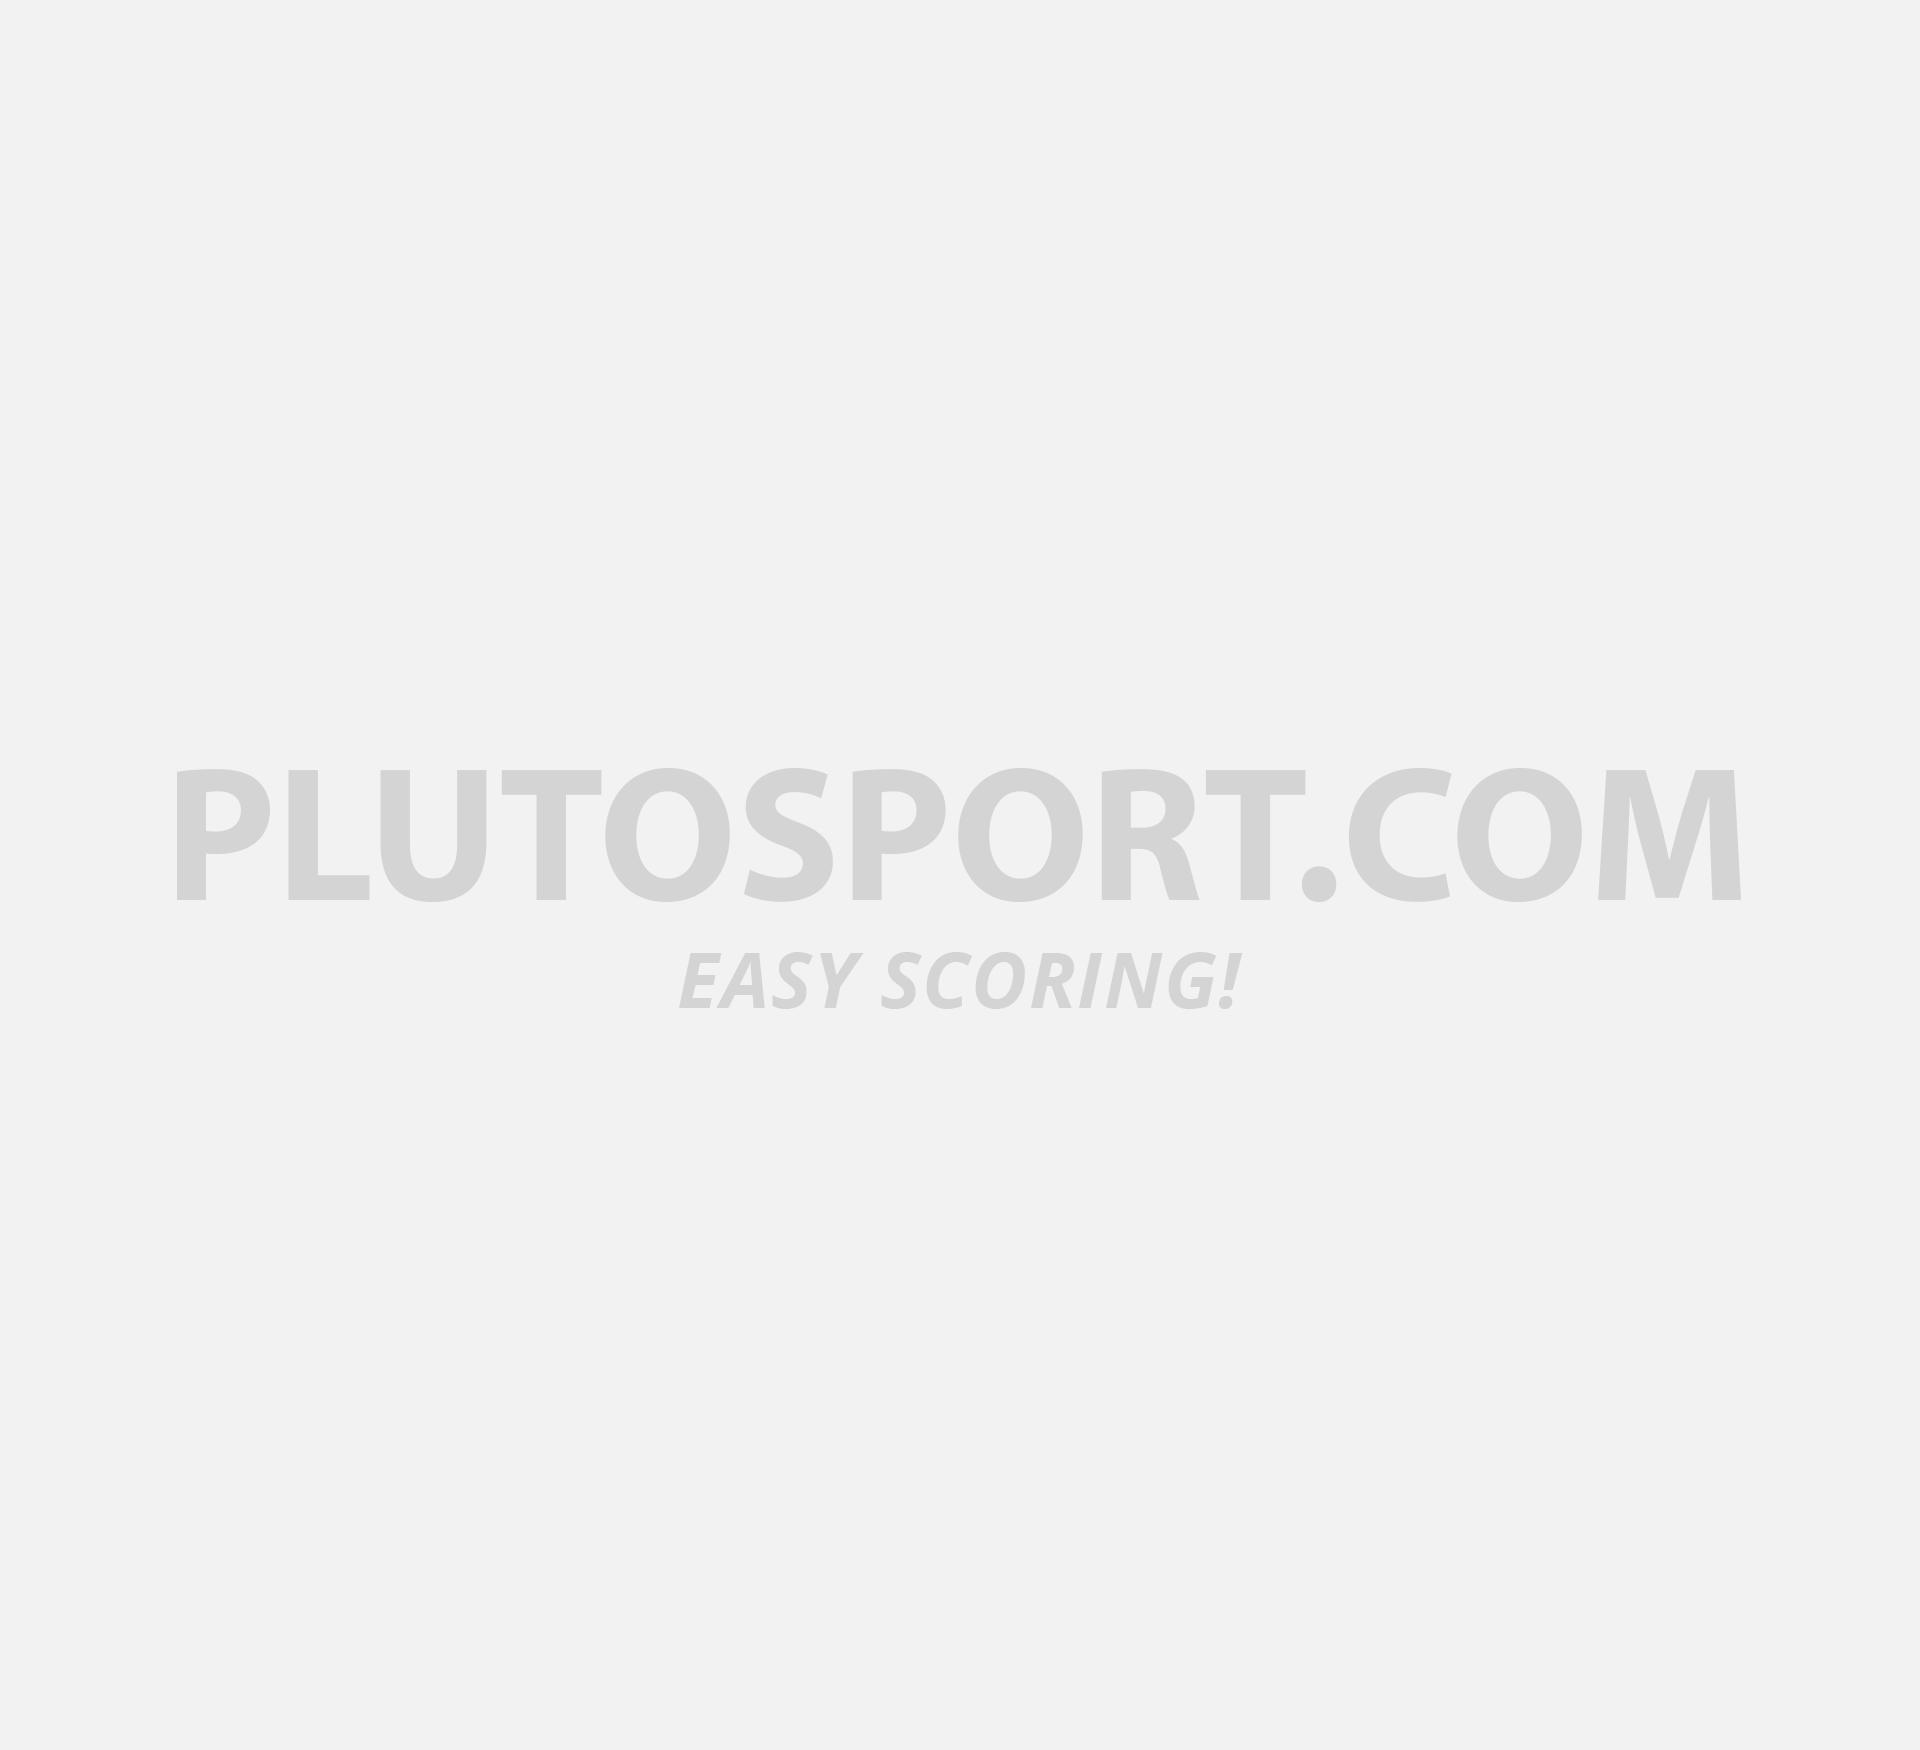 best website 9a87d 651c6 Adidas Gazelle 2 CF C - Sneakers - Shoes - Lifestyle - Sports  Plutosport